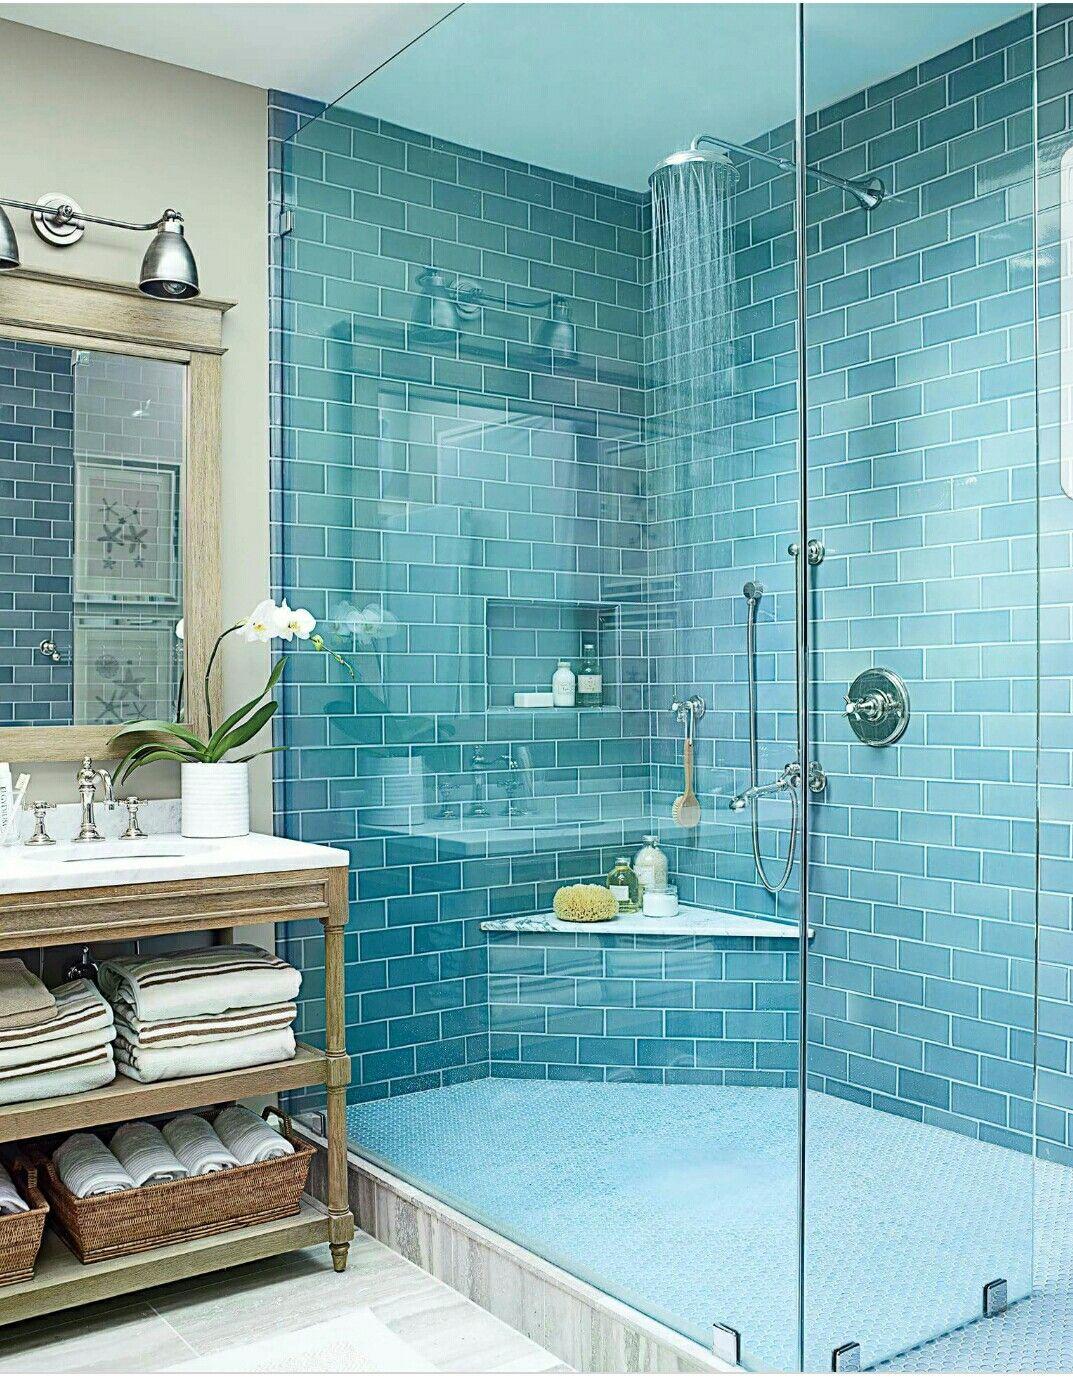 Bathroom Tiles Bathroom Interior Simple Bathroom Simple